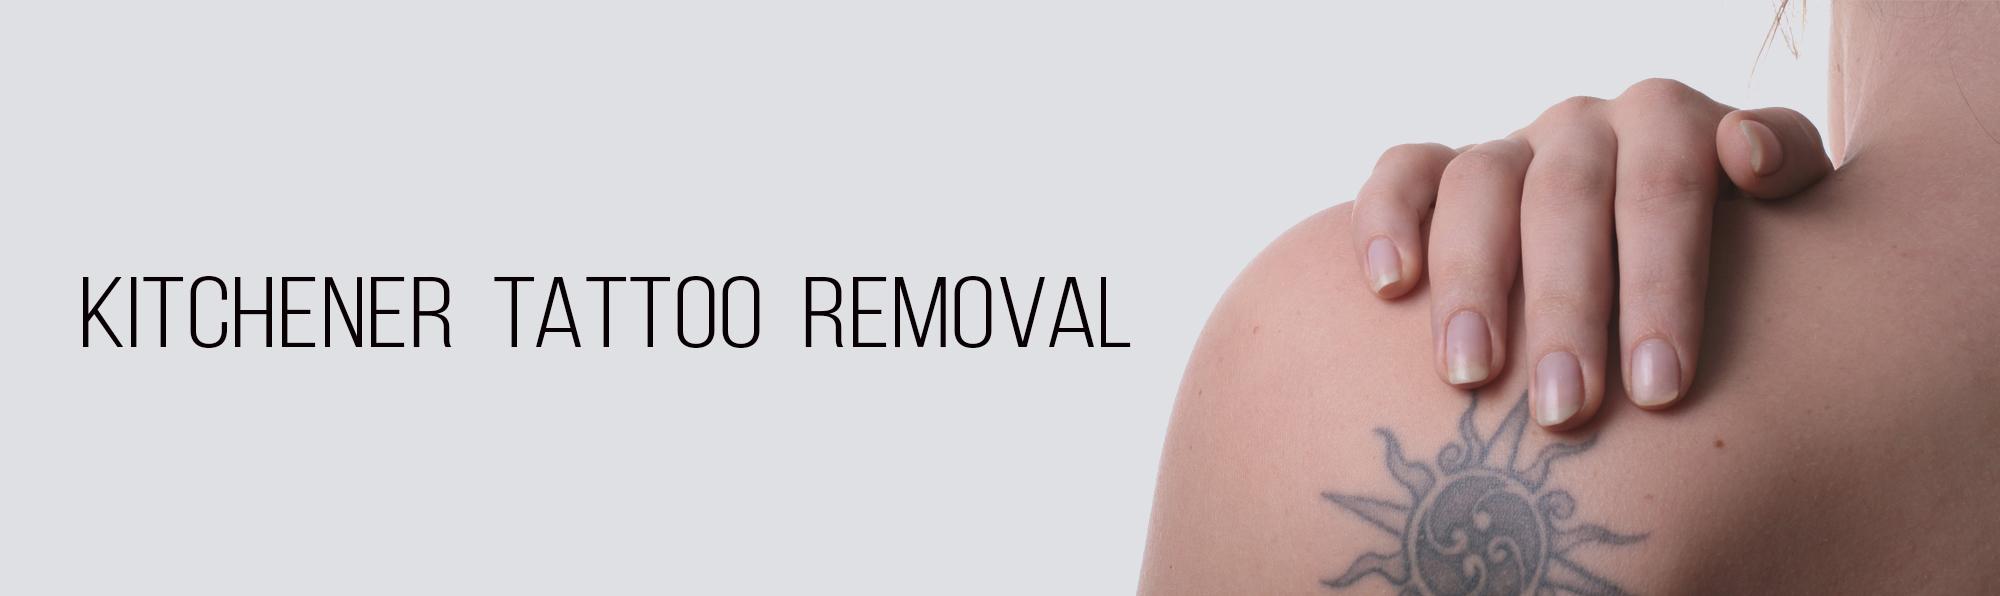 Kitchener Tattoo Removal